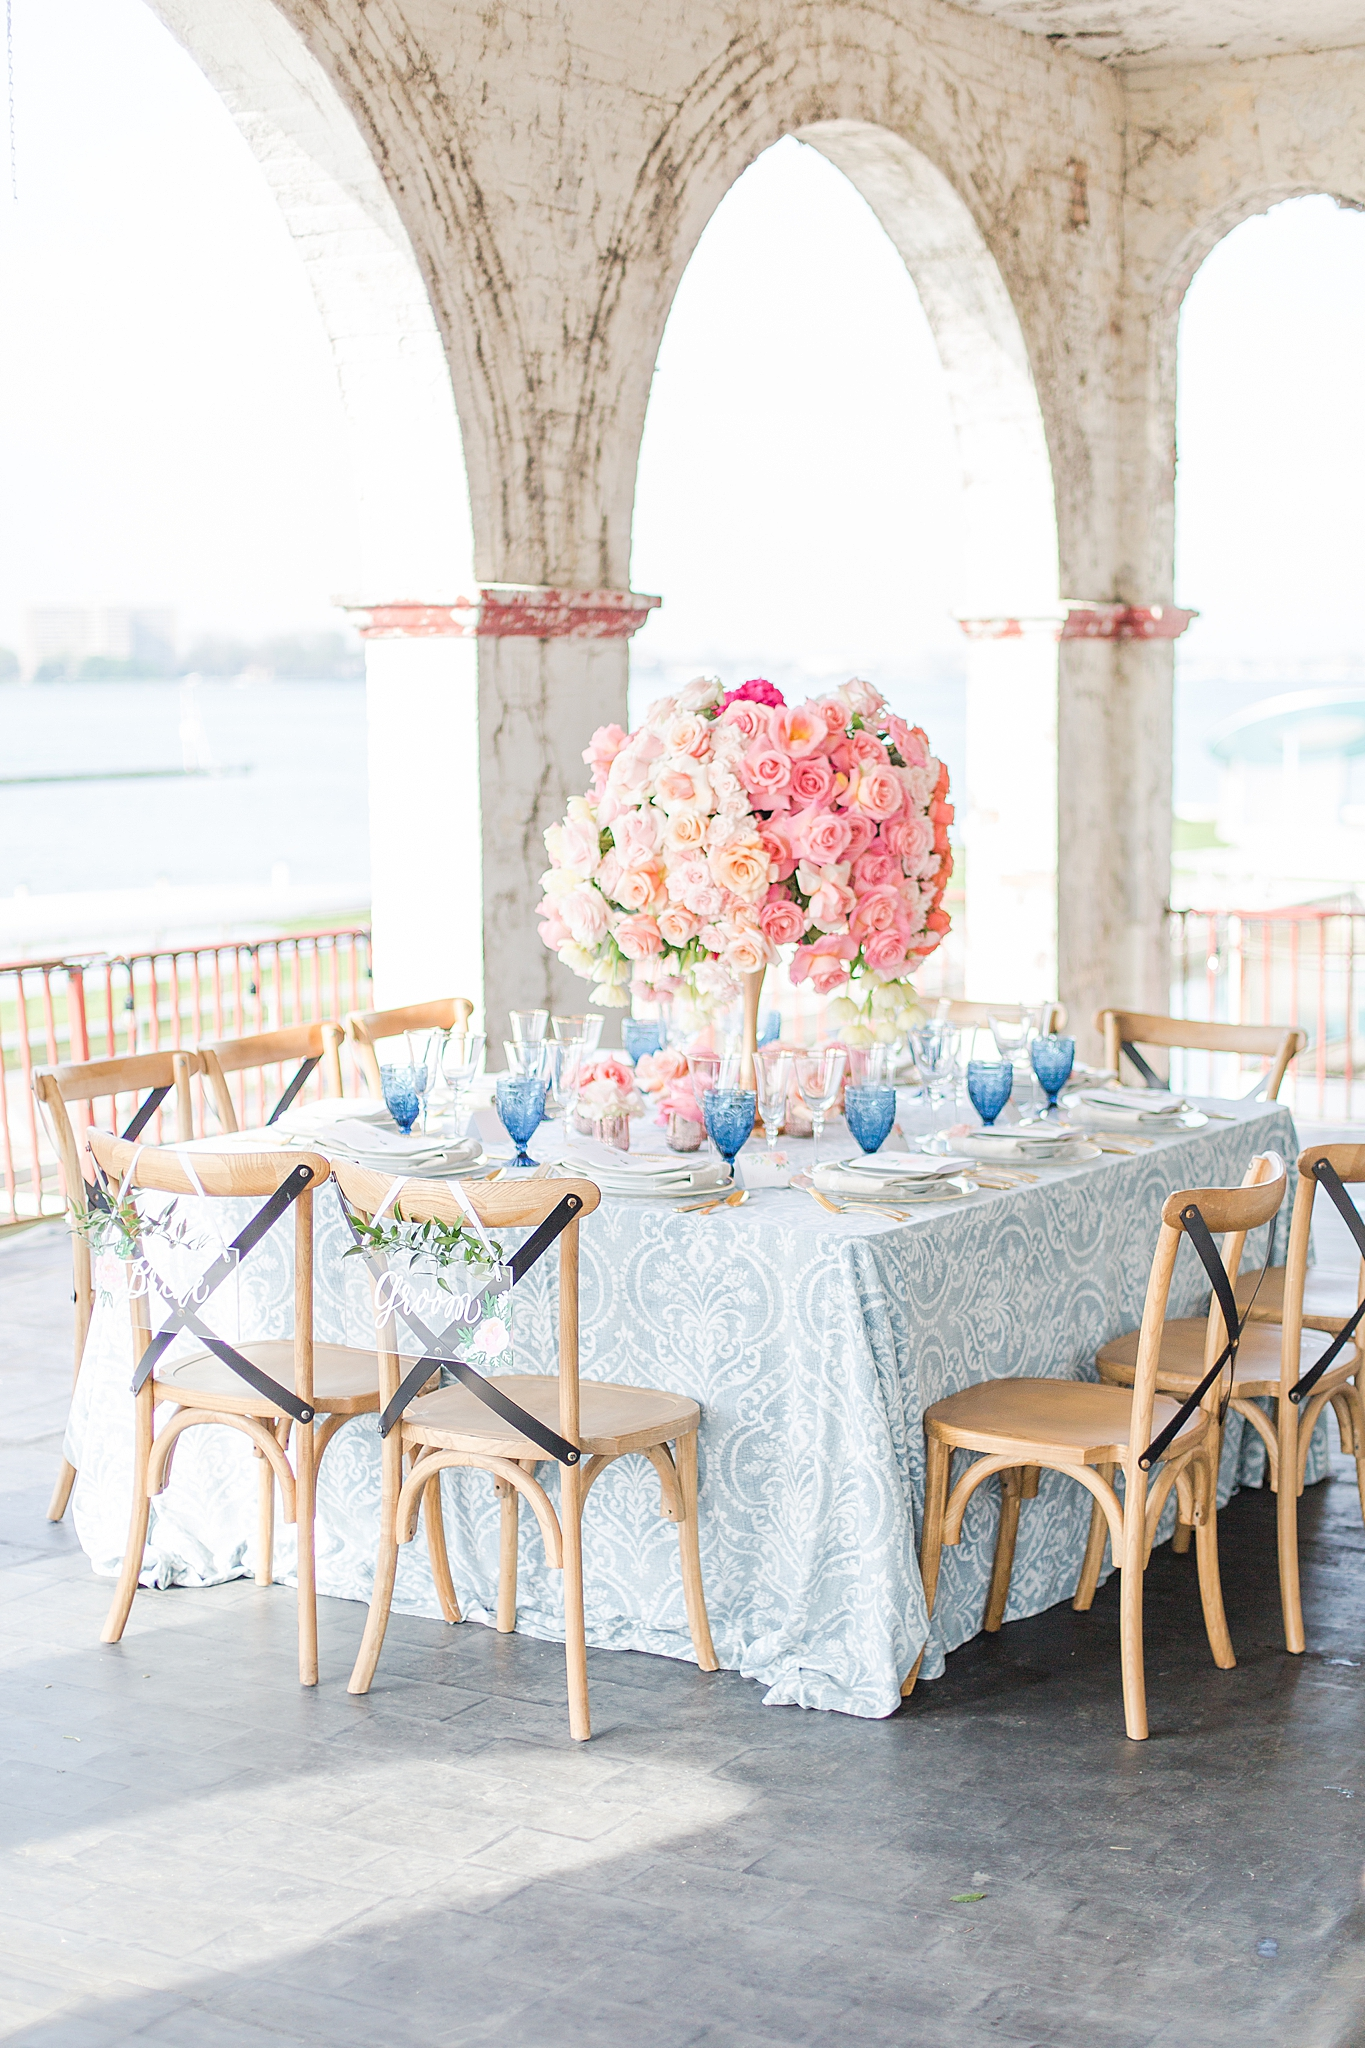 detroit-wedding-photographer-belle-isle-boat-house-by-courtney-carolyn-photography_0001.jpg